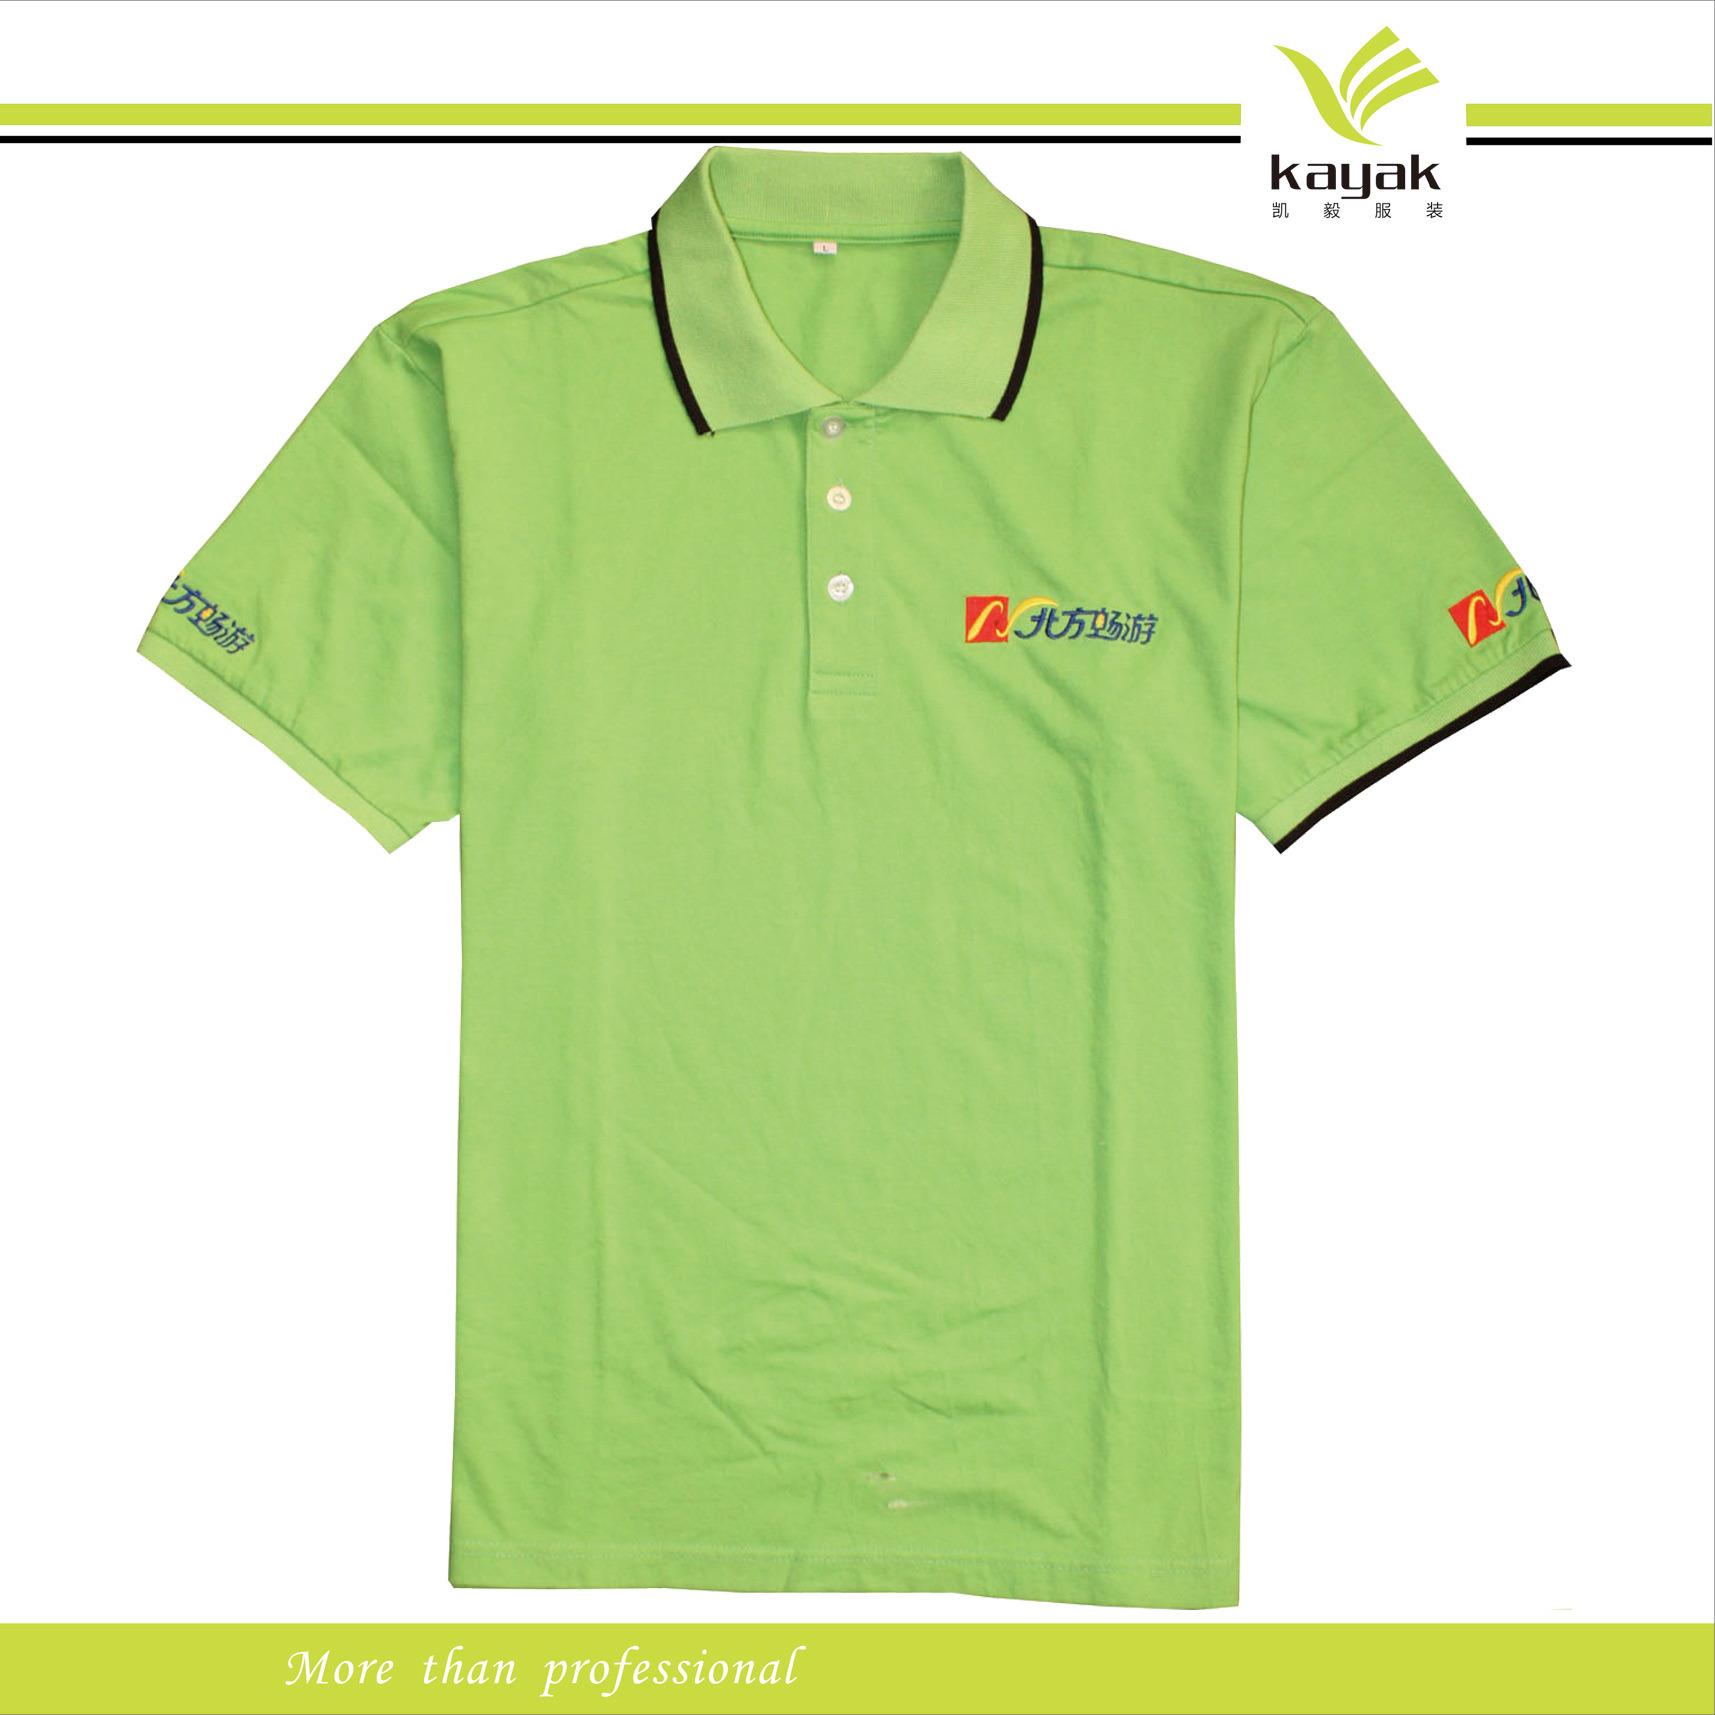 T shirt de polo de conception de logo de broderie p 49 for Polo shirt logo design